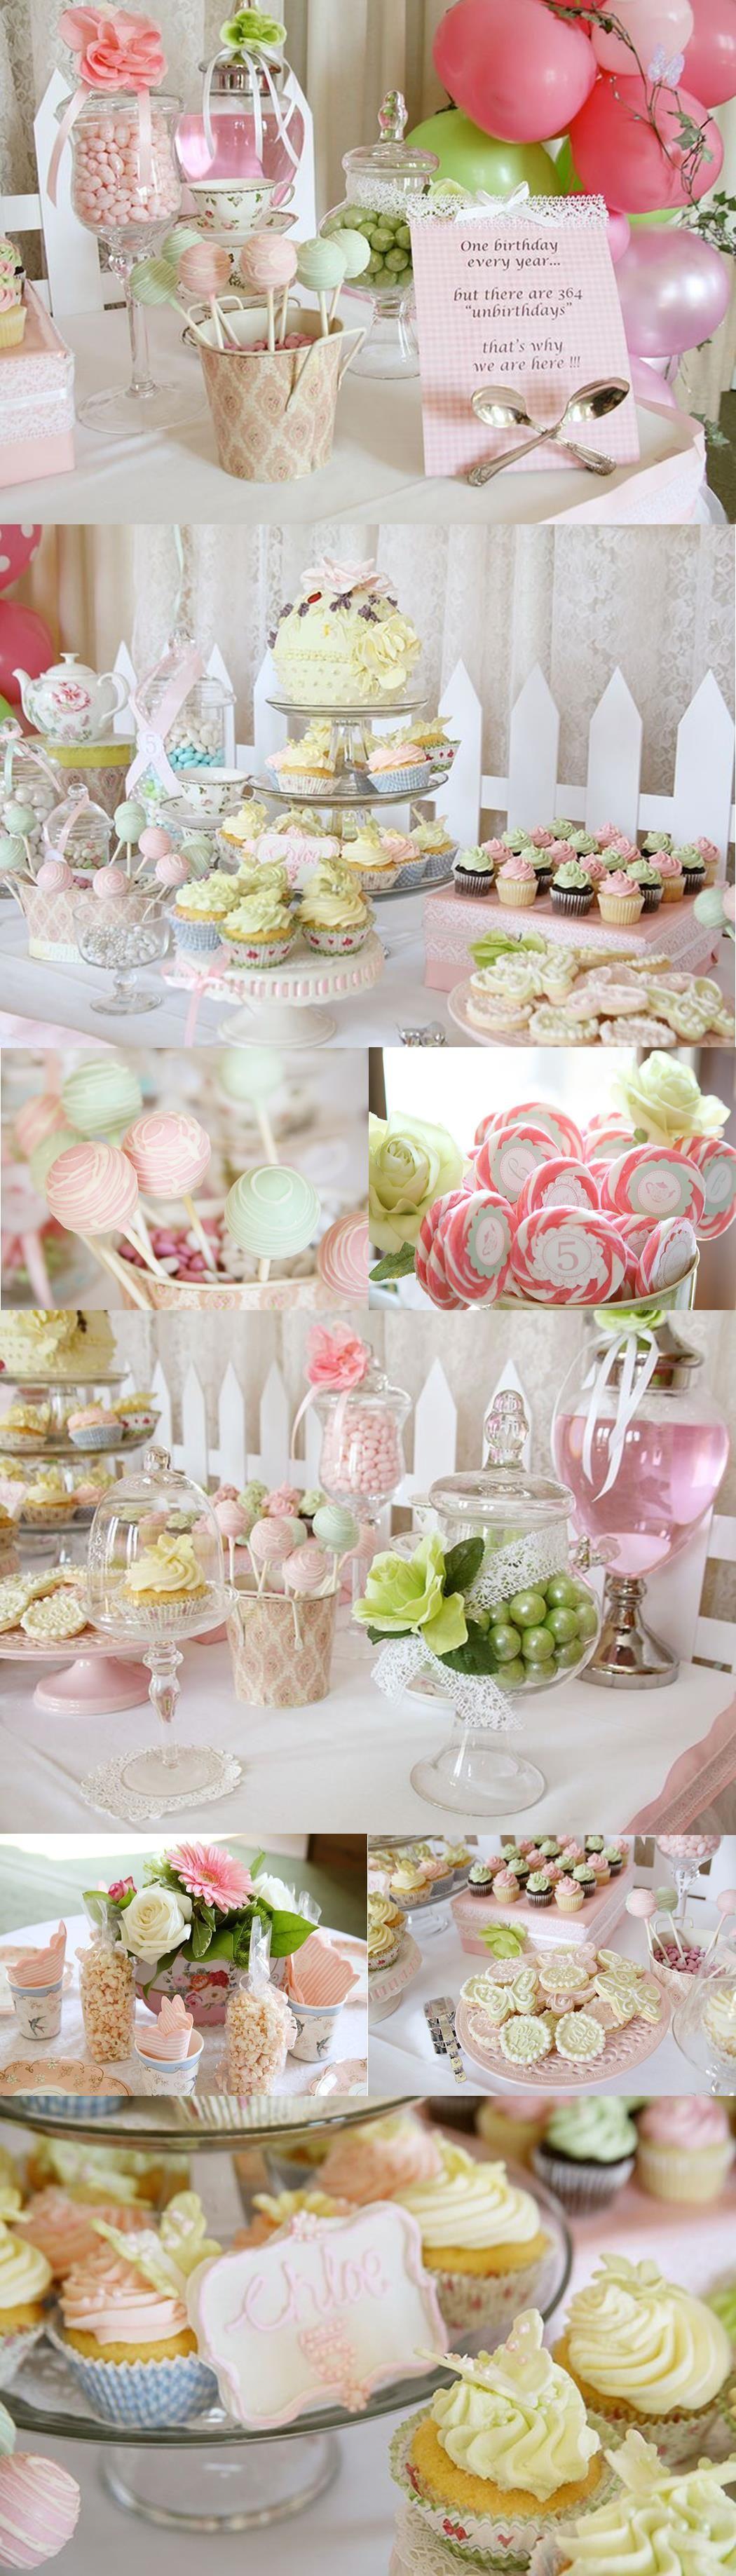 Tea party ideas for High tea party decorations